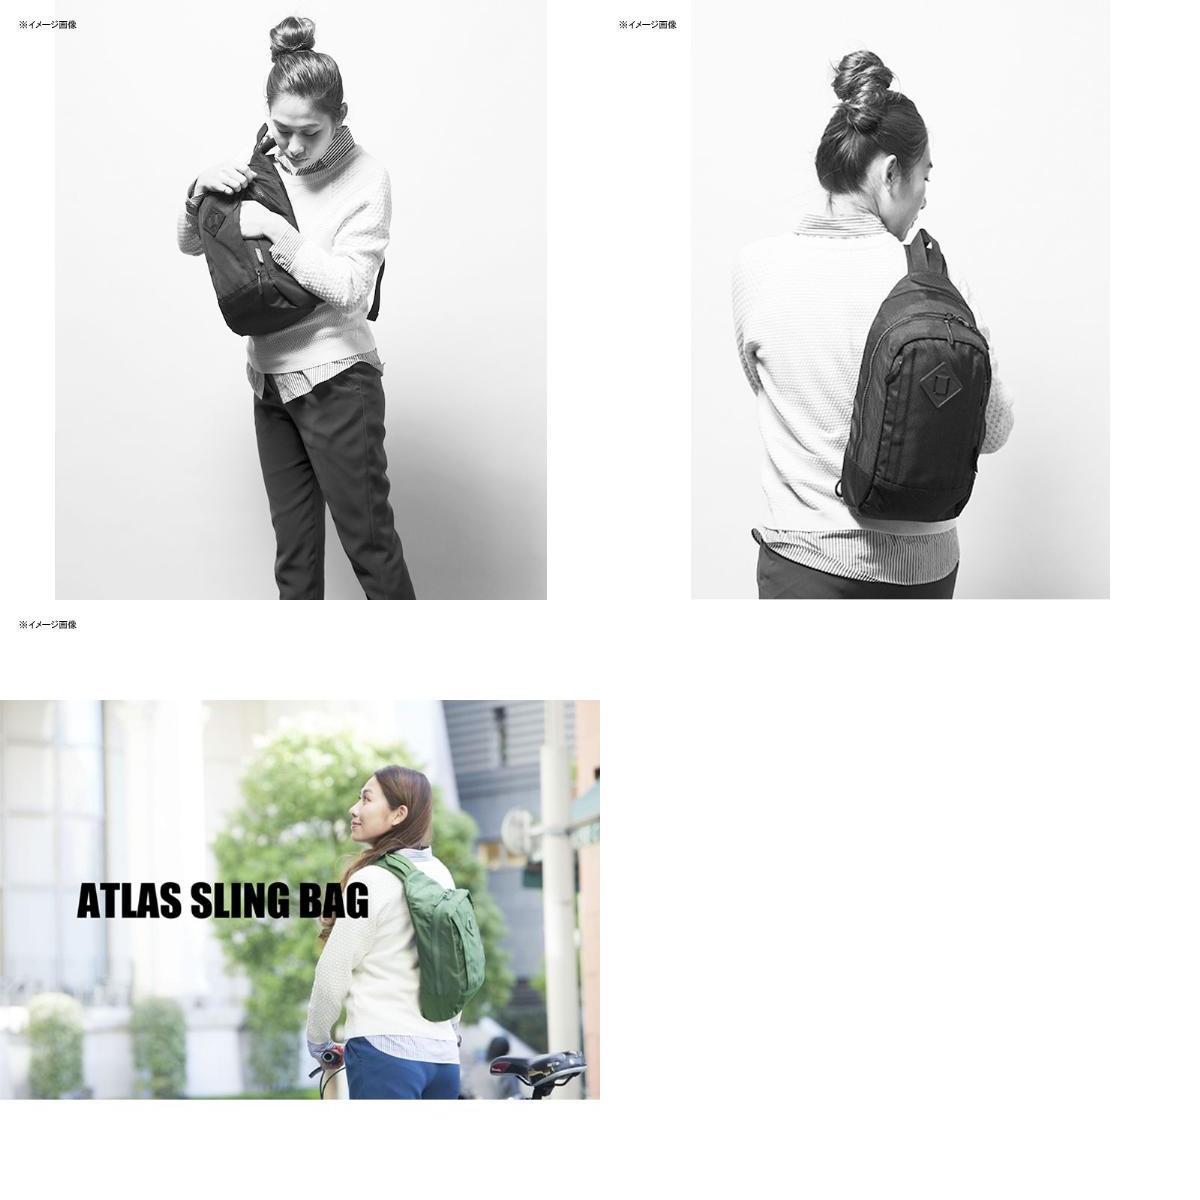 Coleman(コールマン) アトラス スリングバッグ/ATLAS SLING BAG 5L カクタスグリーン 2000032994